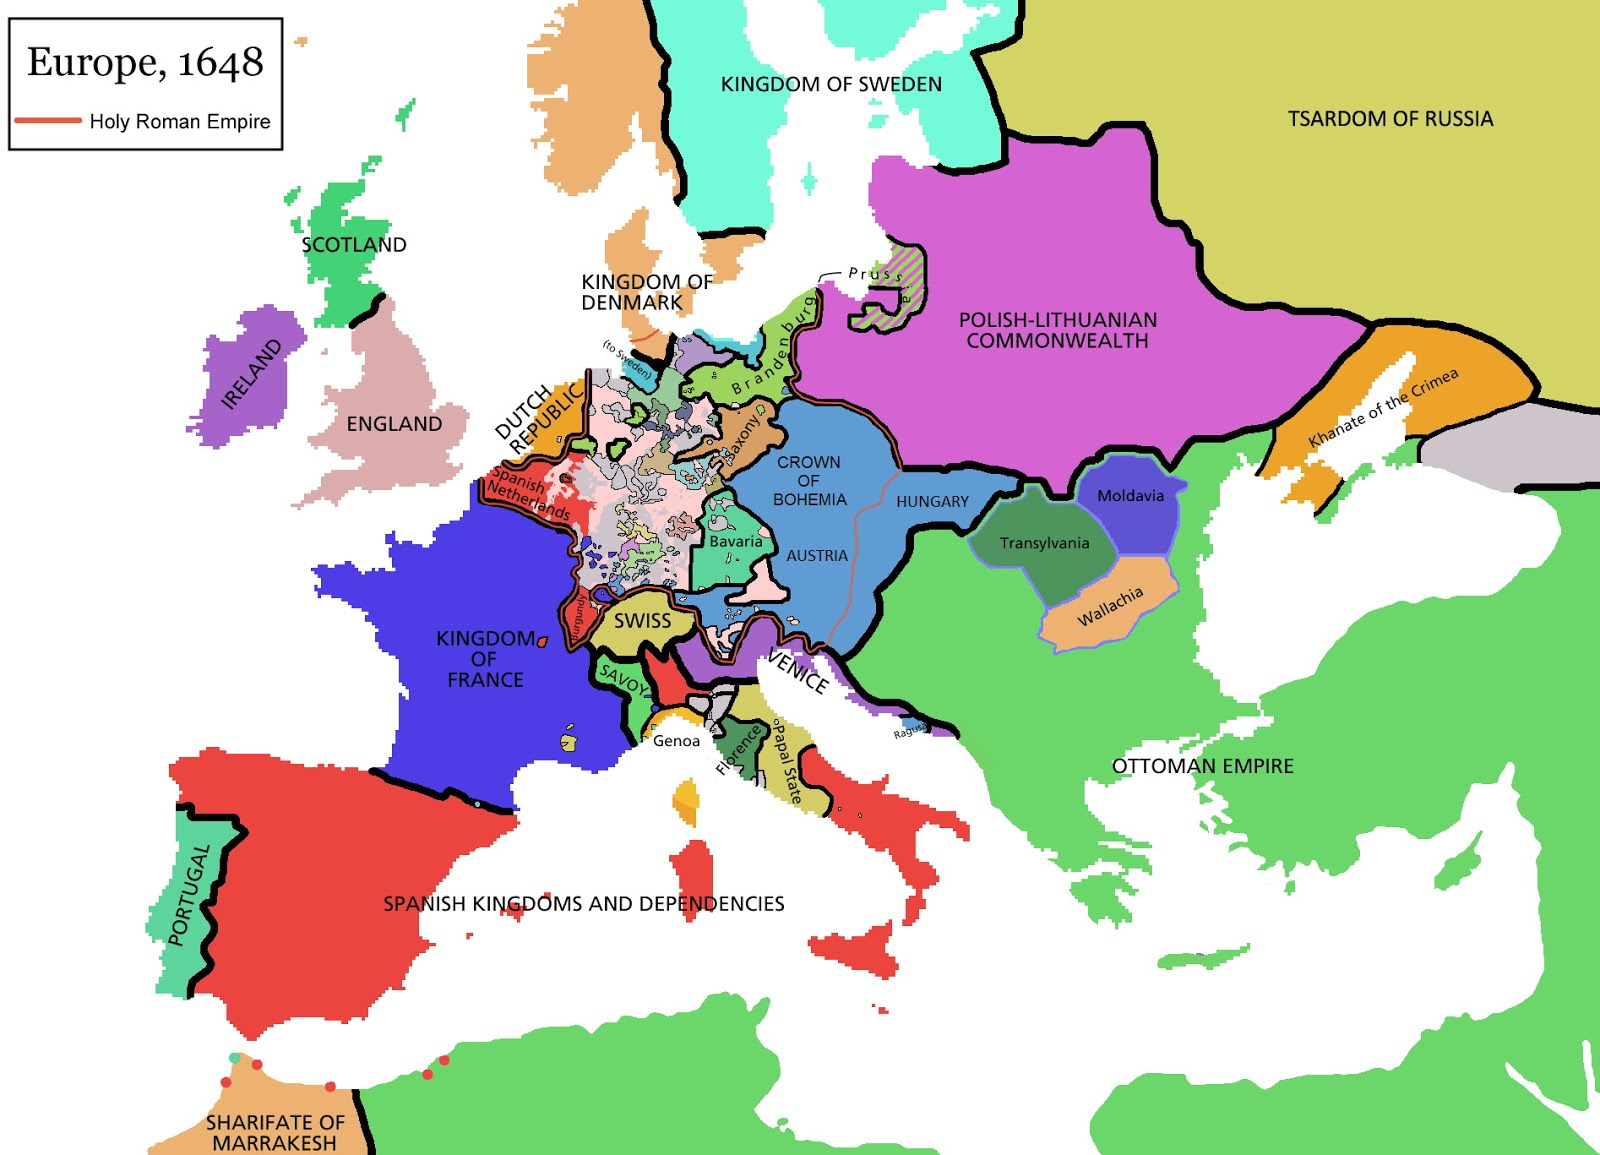 Europe (1648)